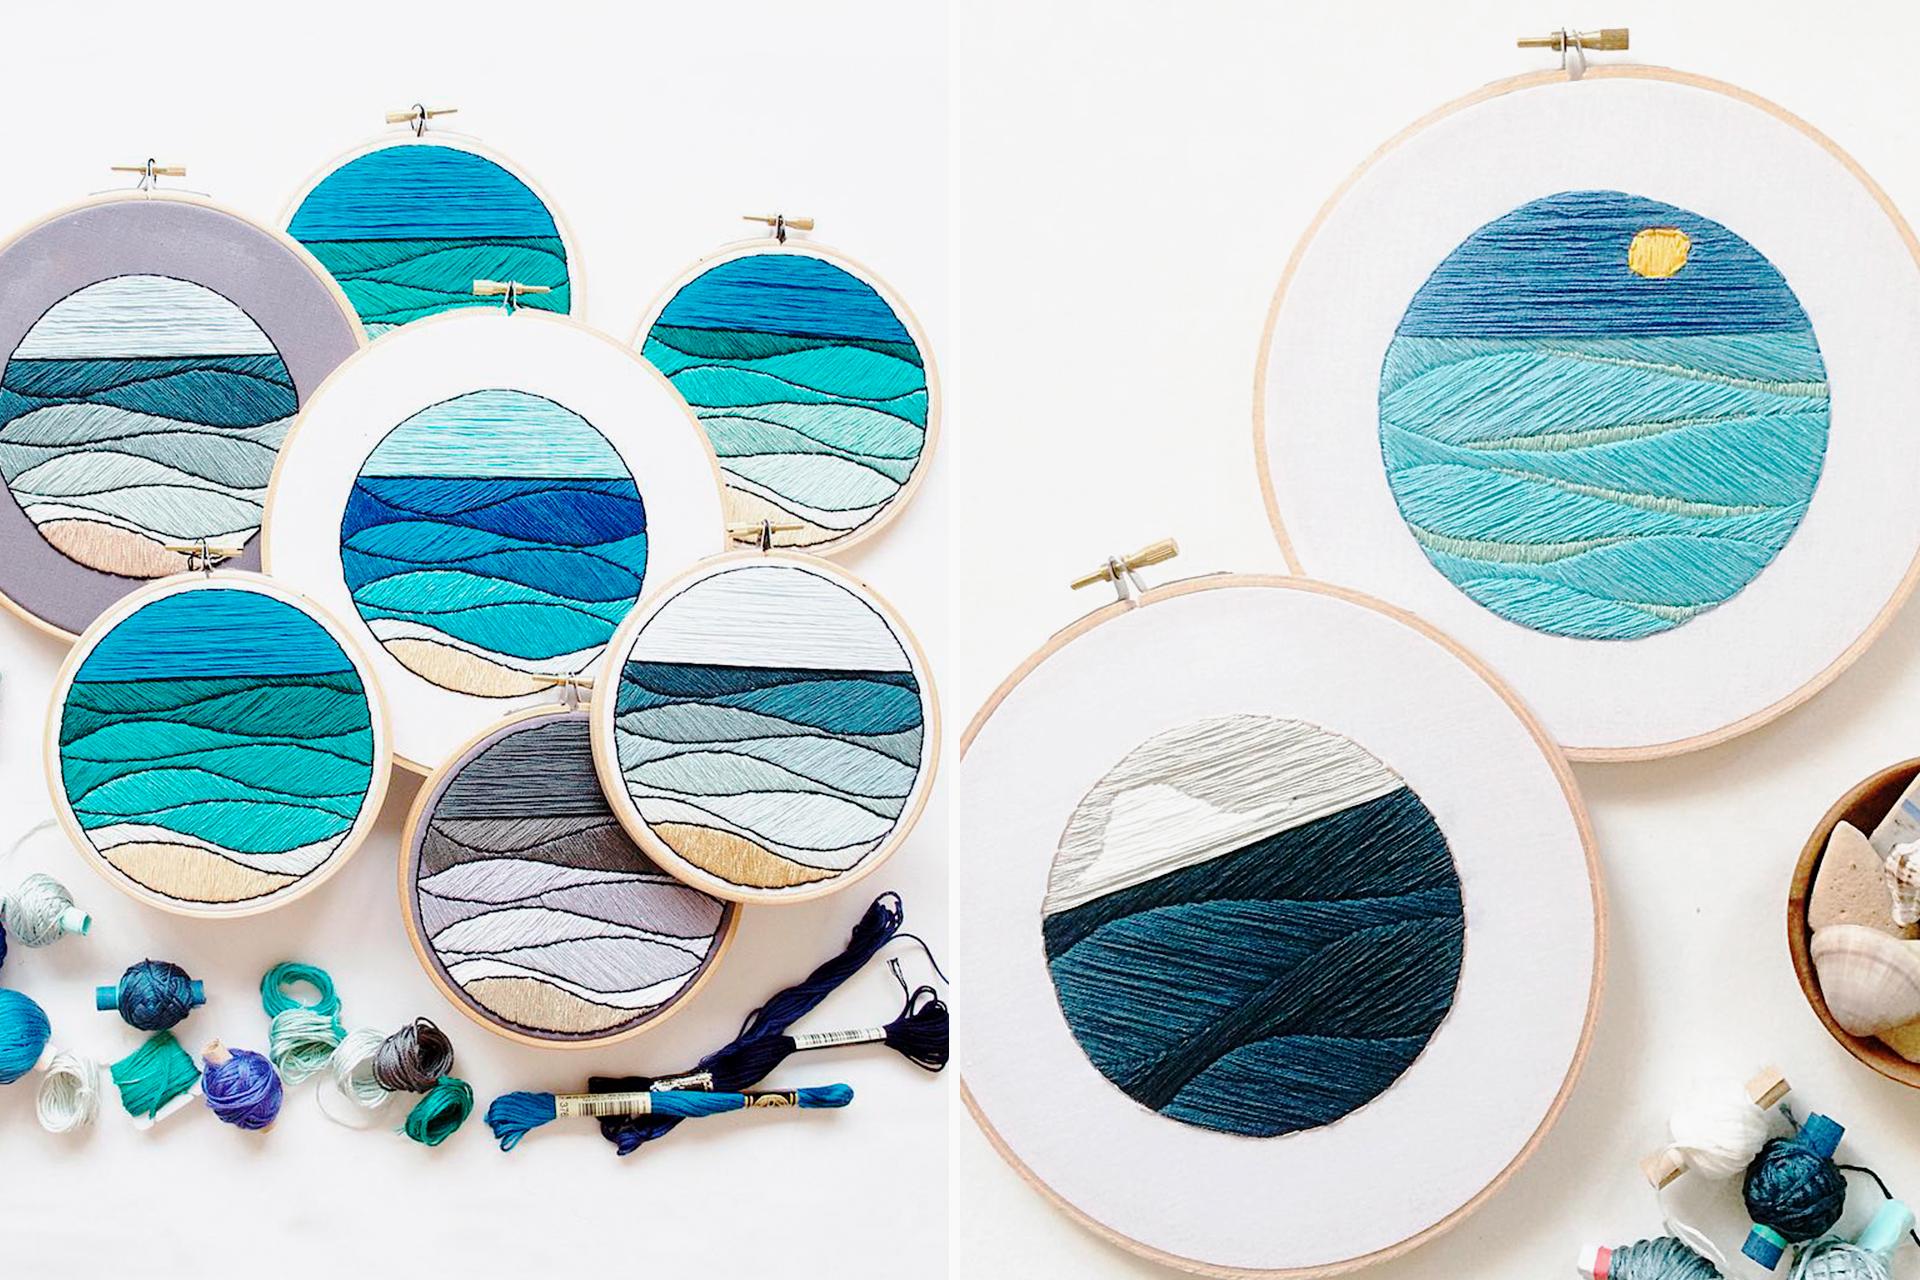 ocean of yarn 2.jpg